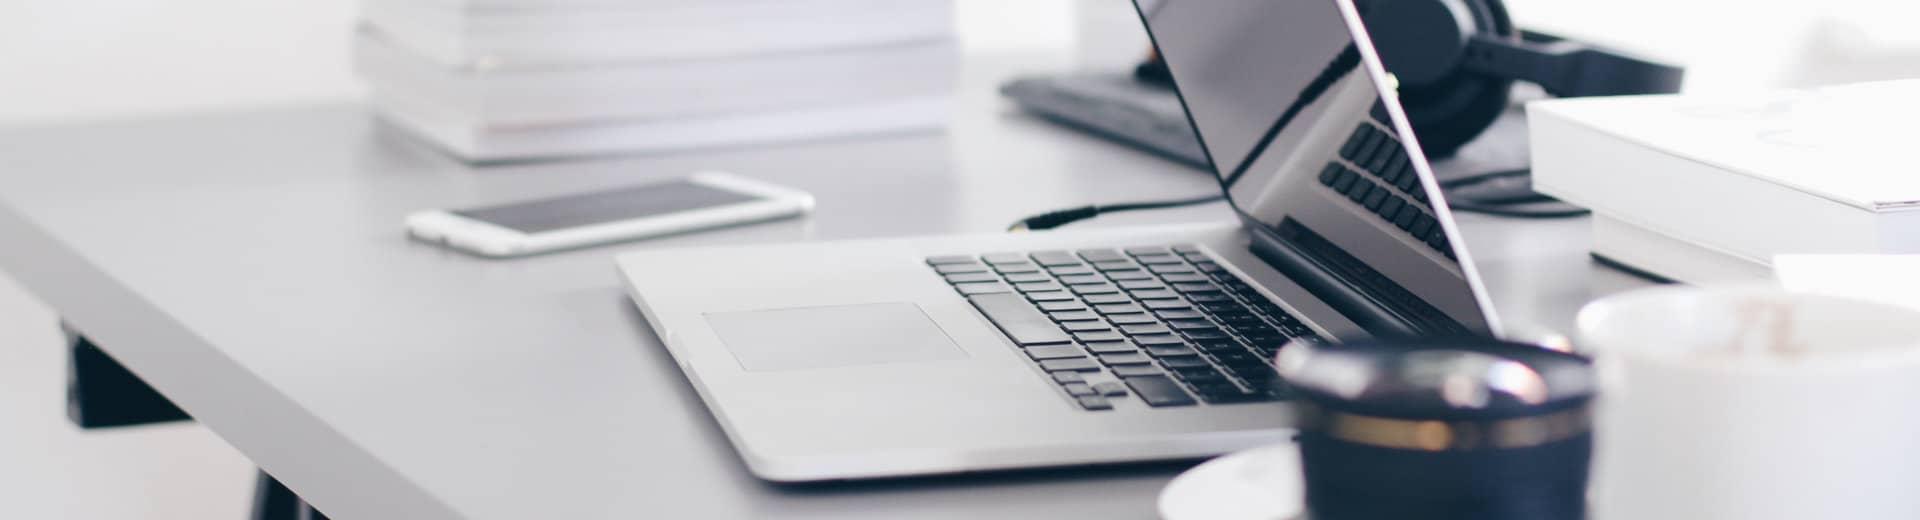 subheader_contributors_laptop_on_table